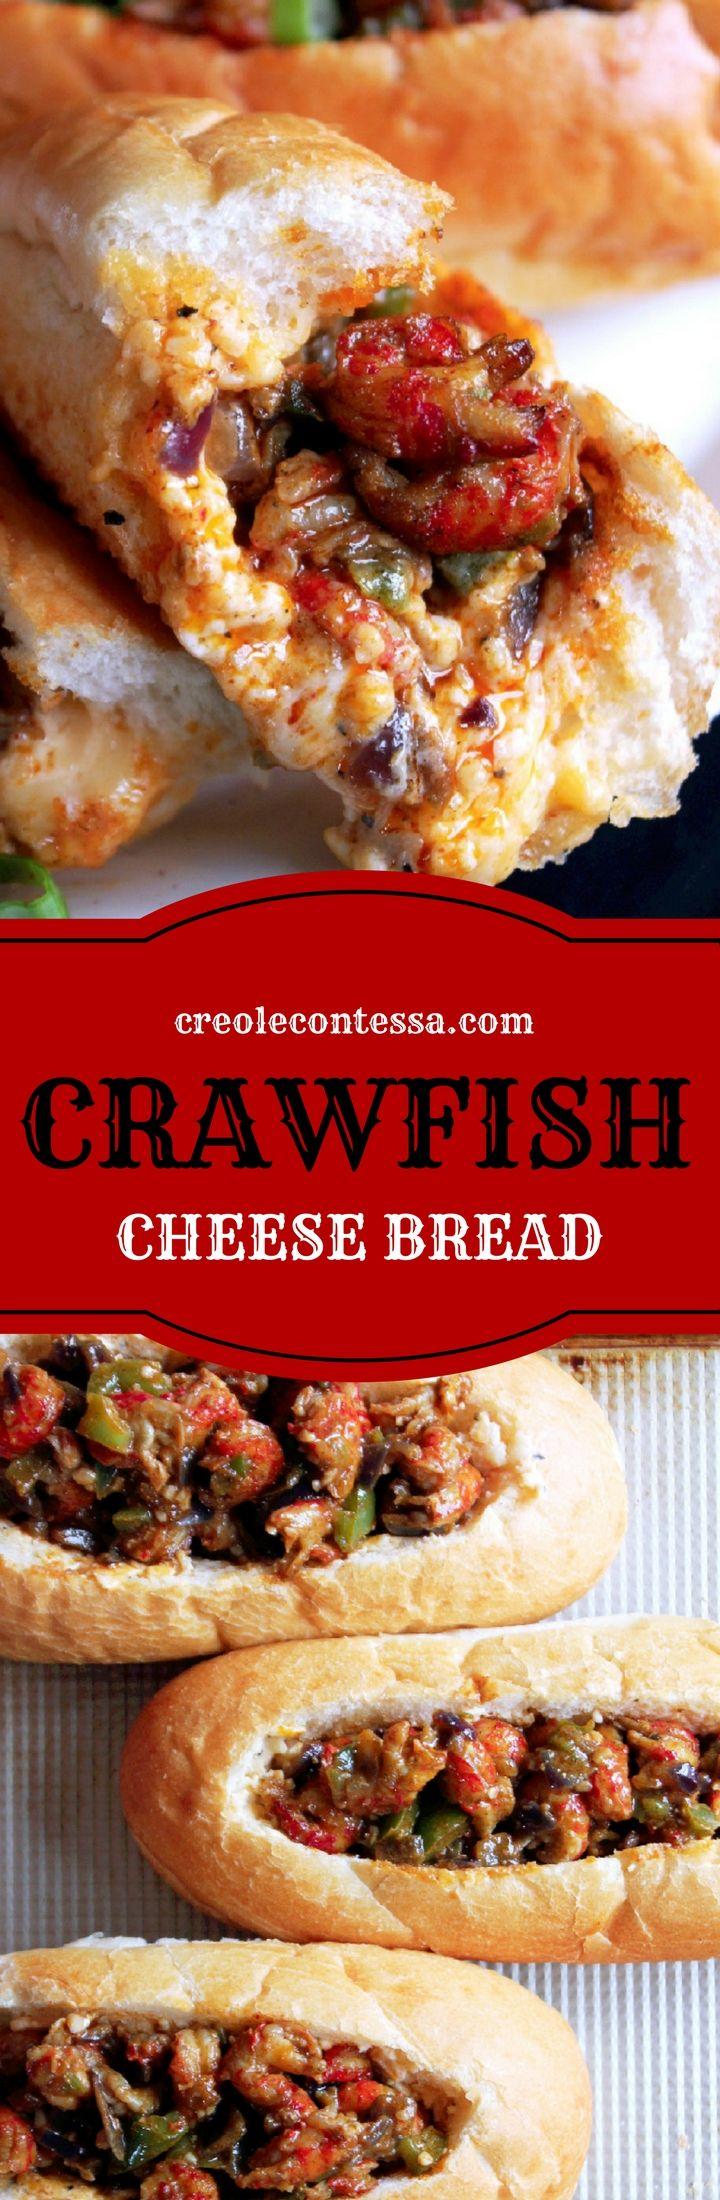 Crawfish Cheese Bread-Creole Contessa